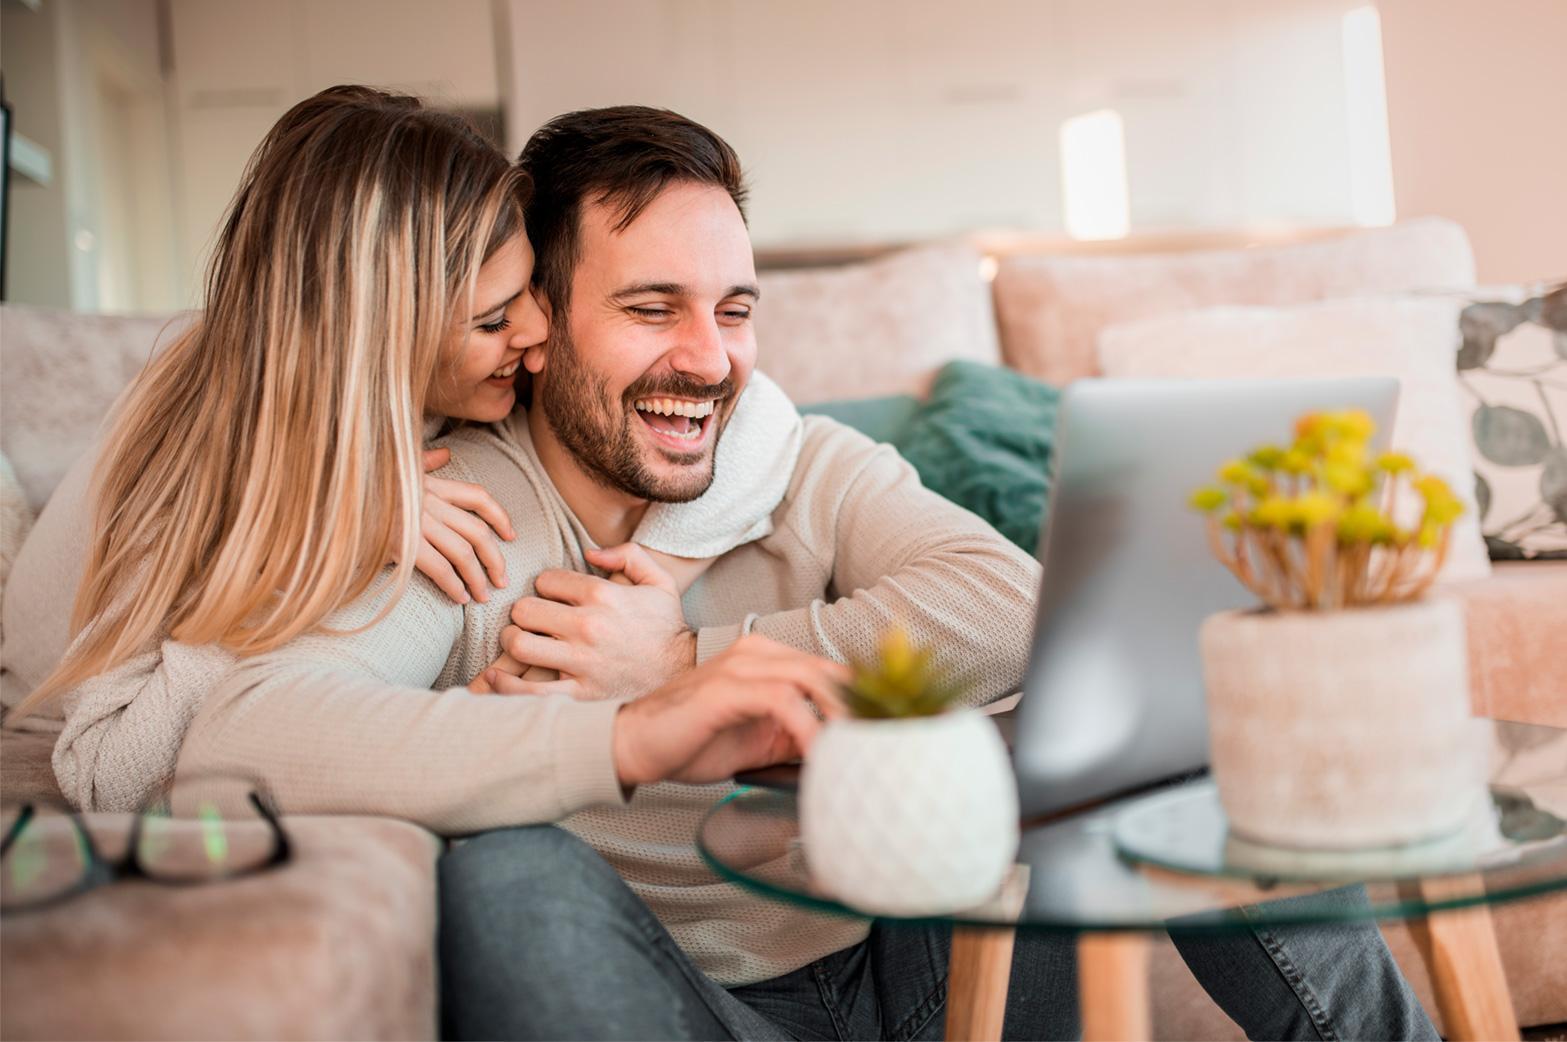 Luopua Internet dating